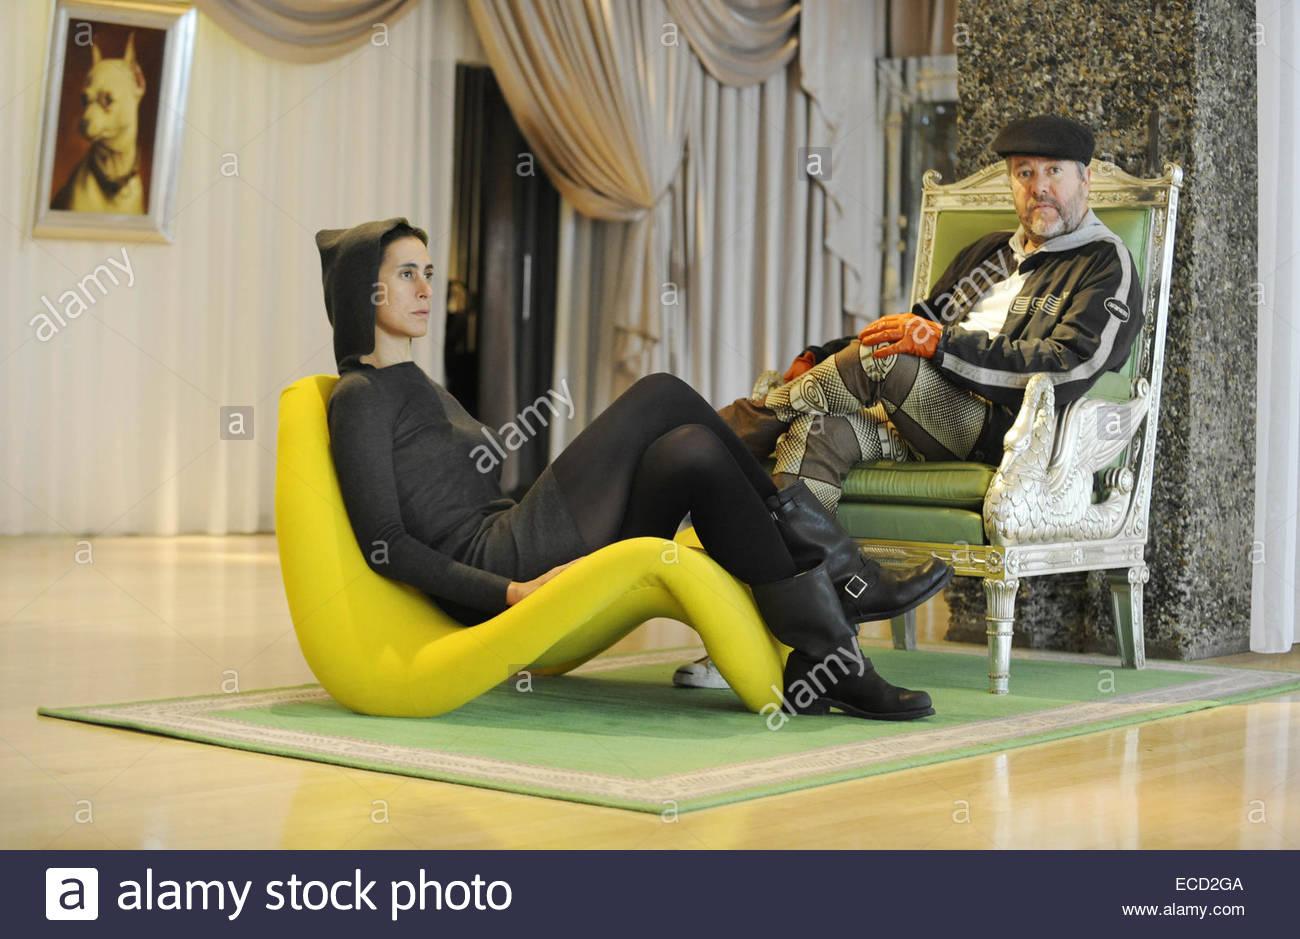 jasmin philippe biography. Black Bedroom Furniture Sets. Home Design Ideas